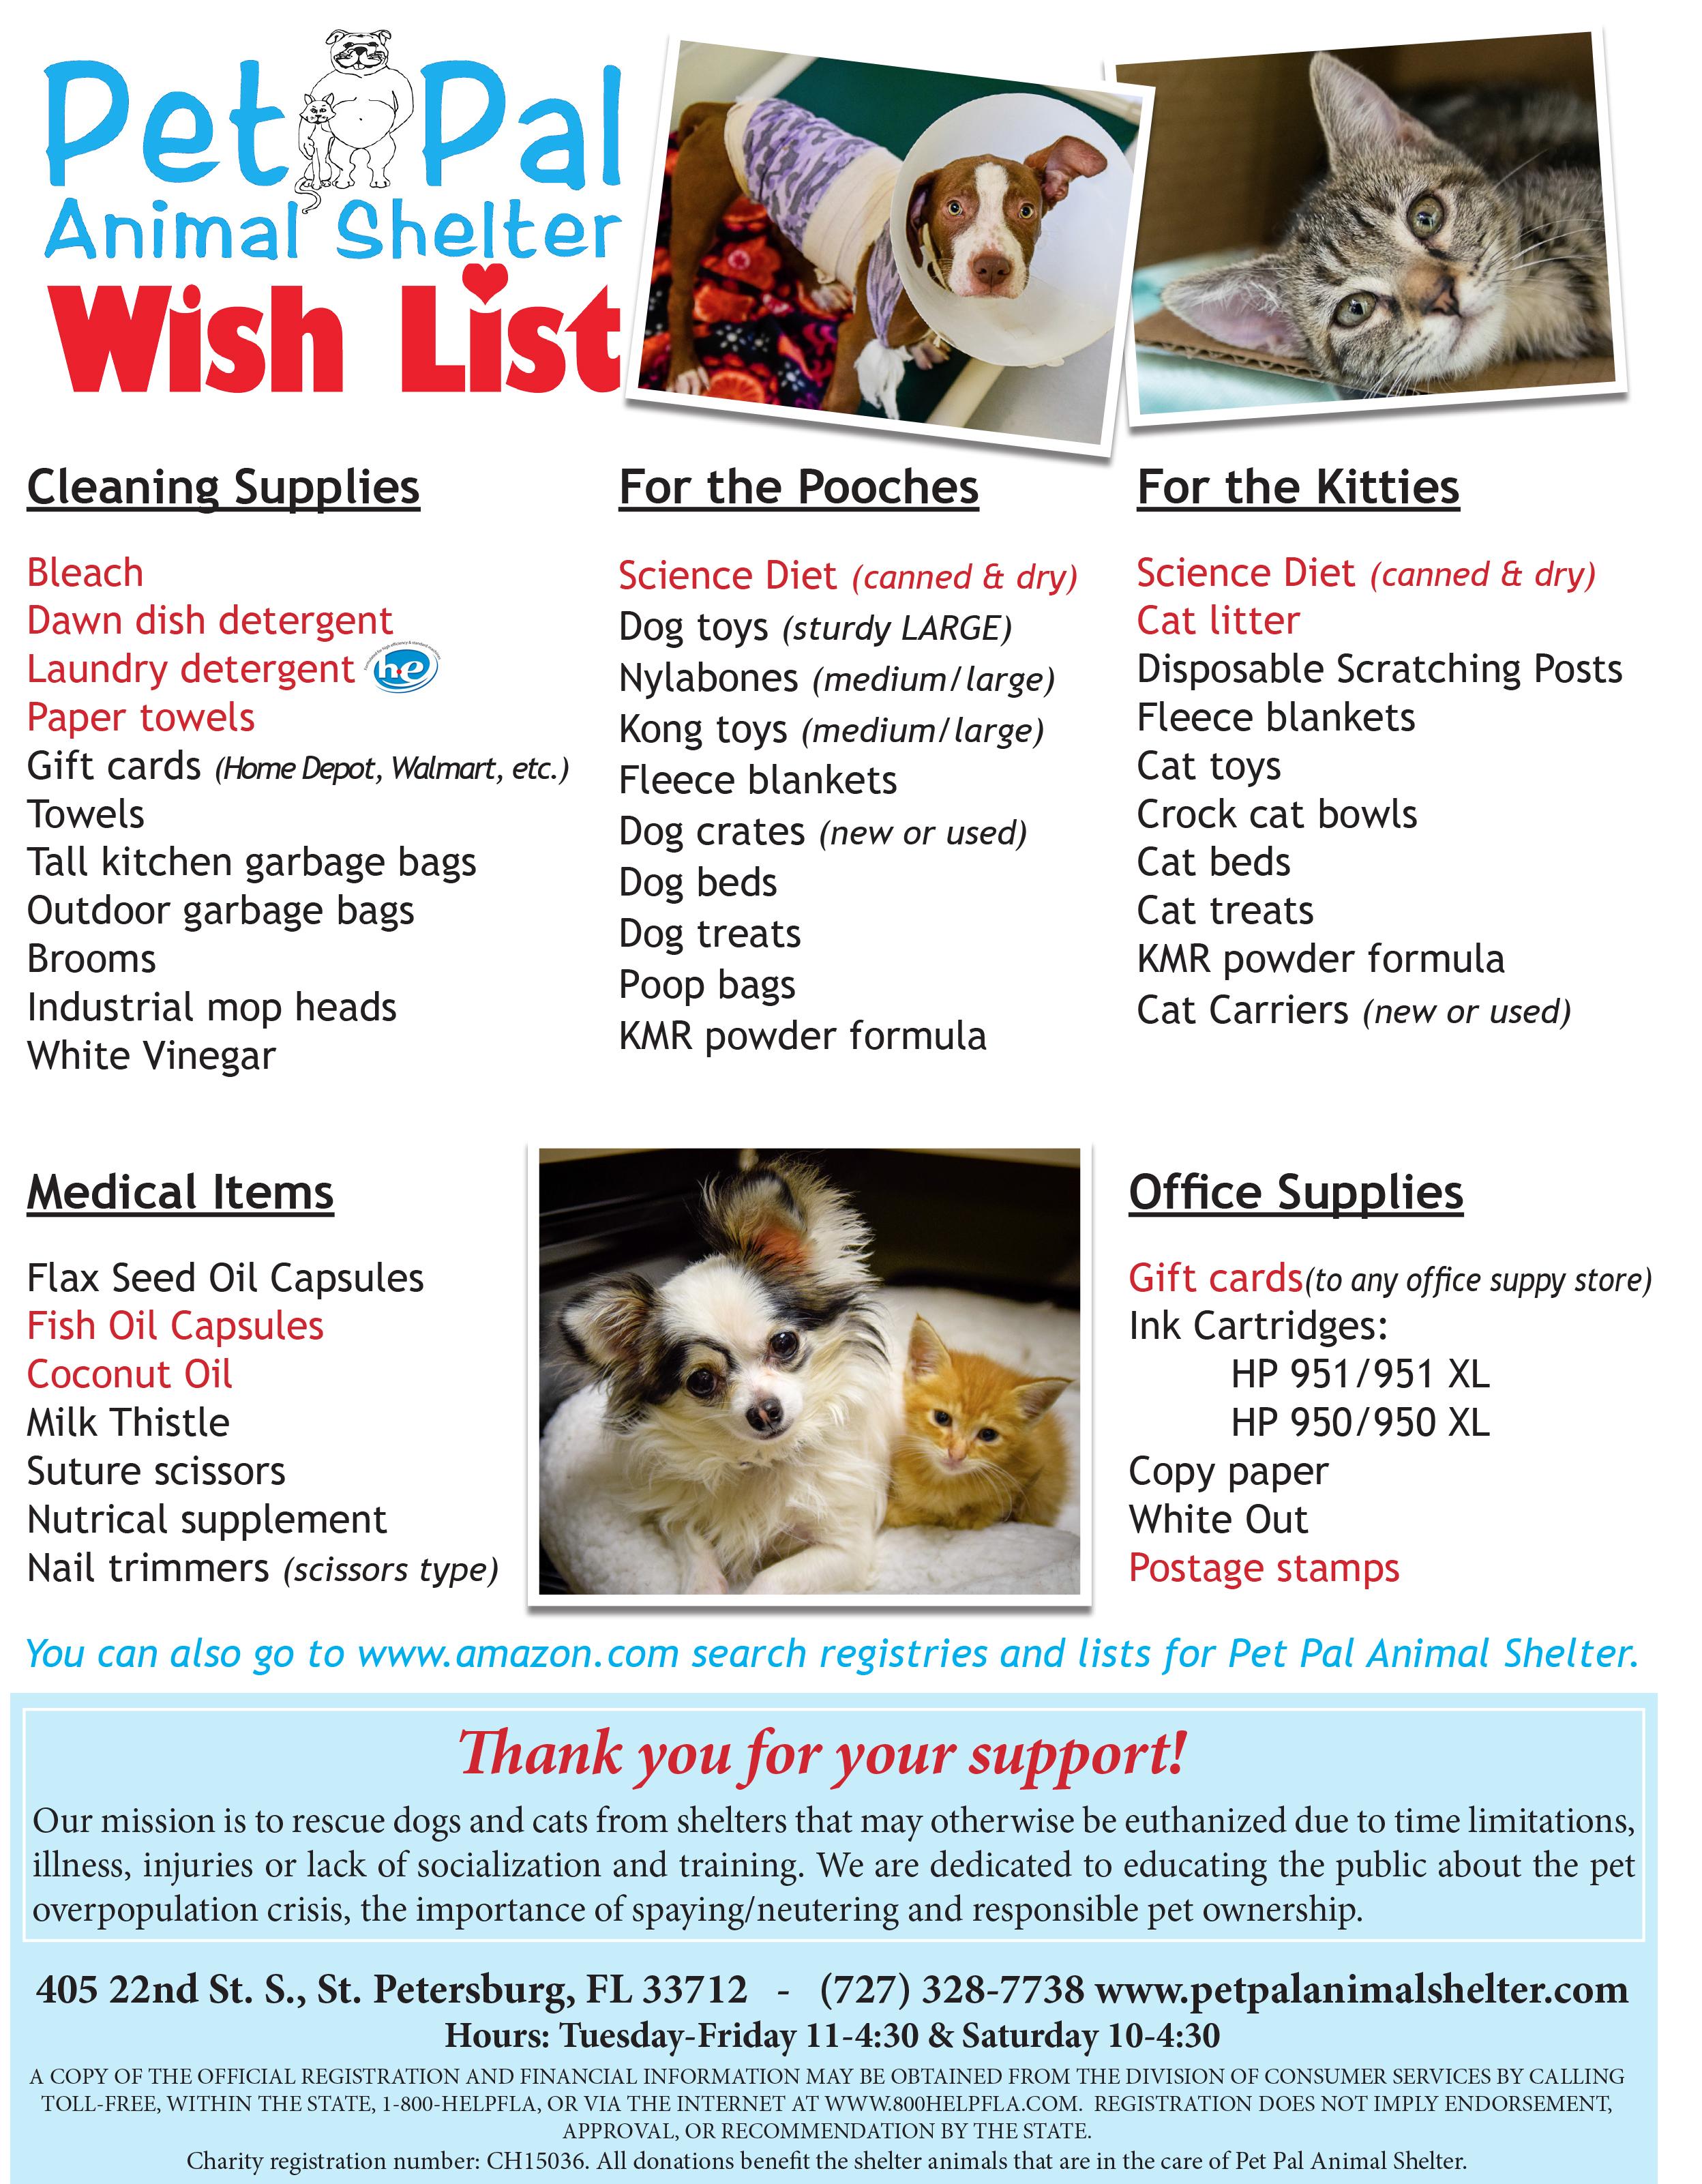 wish-list-2016 - Pet Pal Animal Shelter